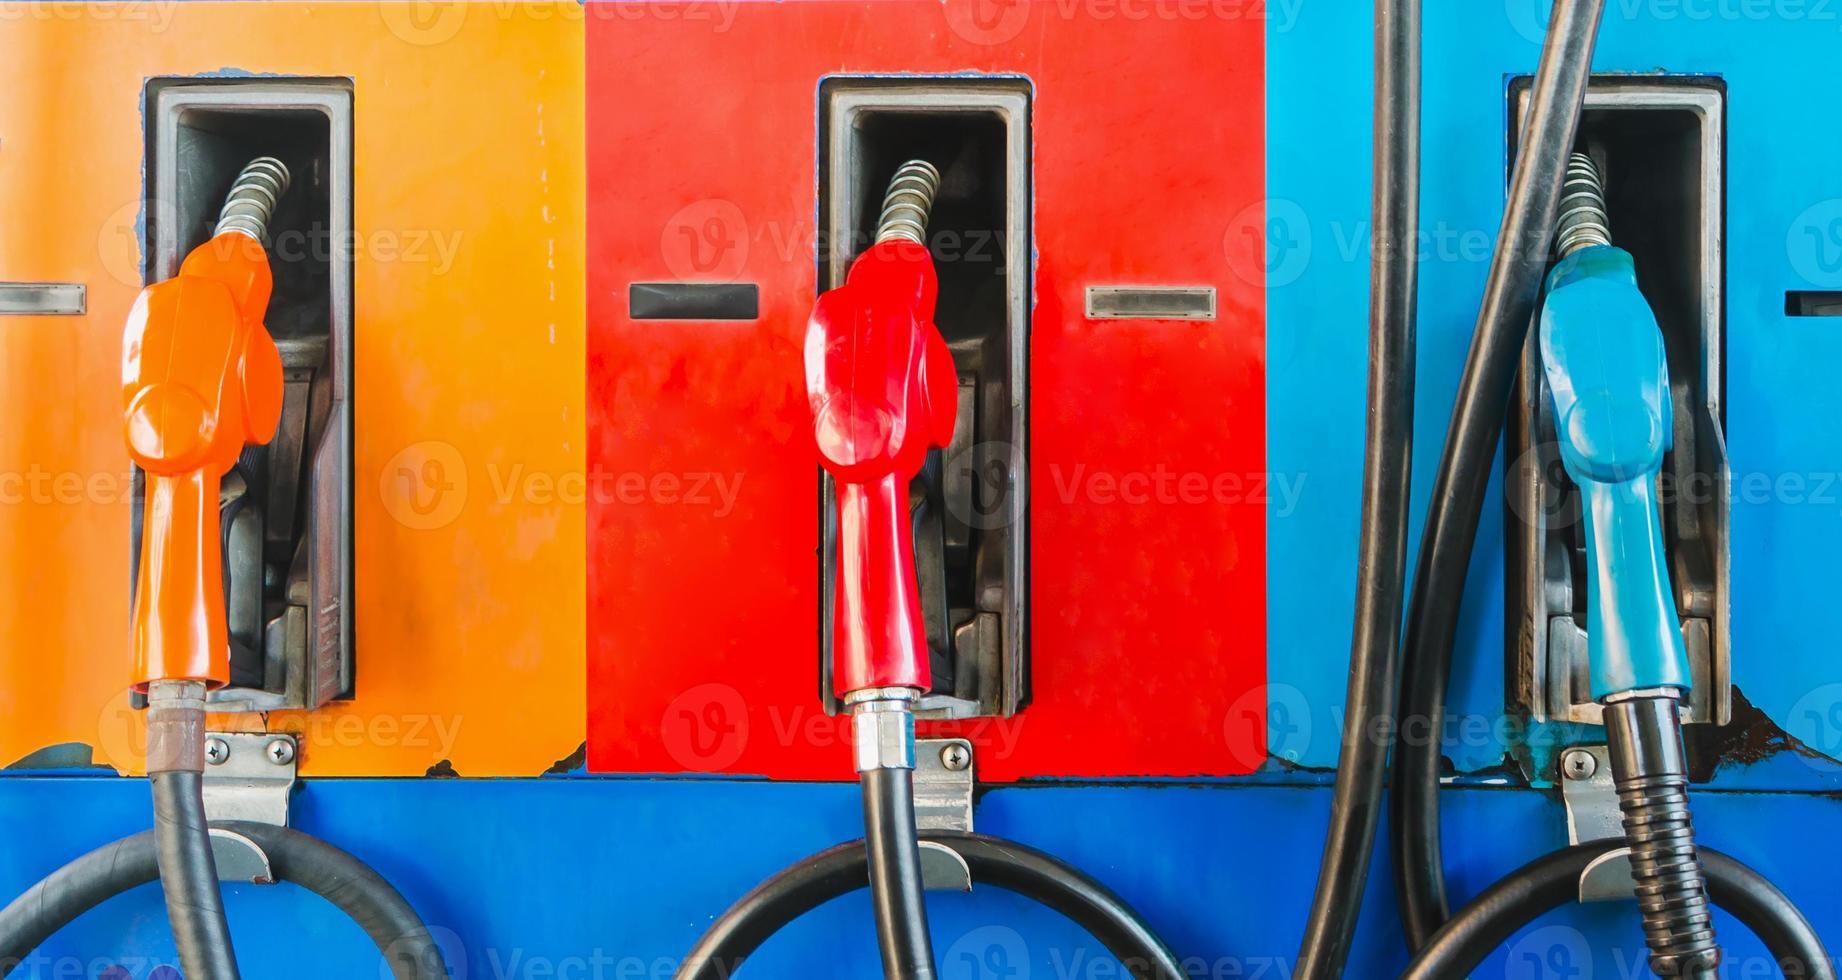 gasoline dispenser photo